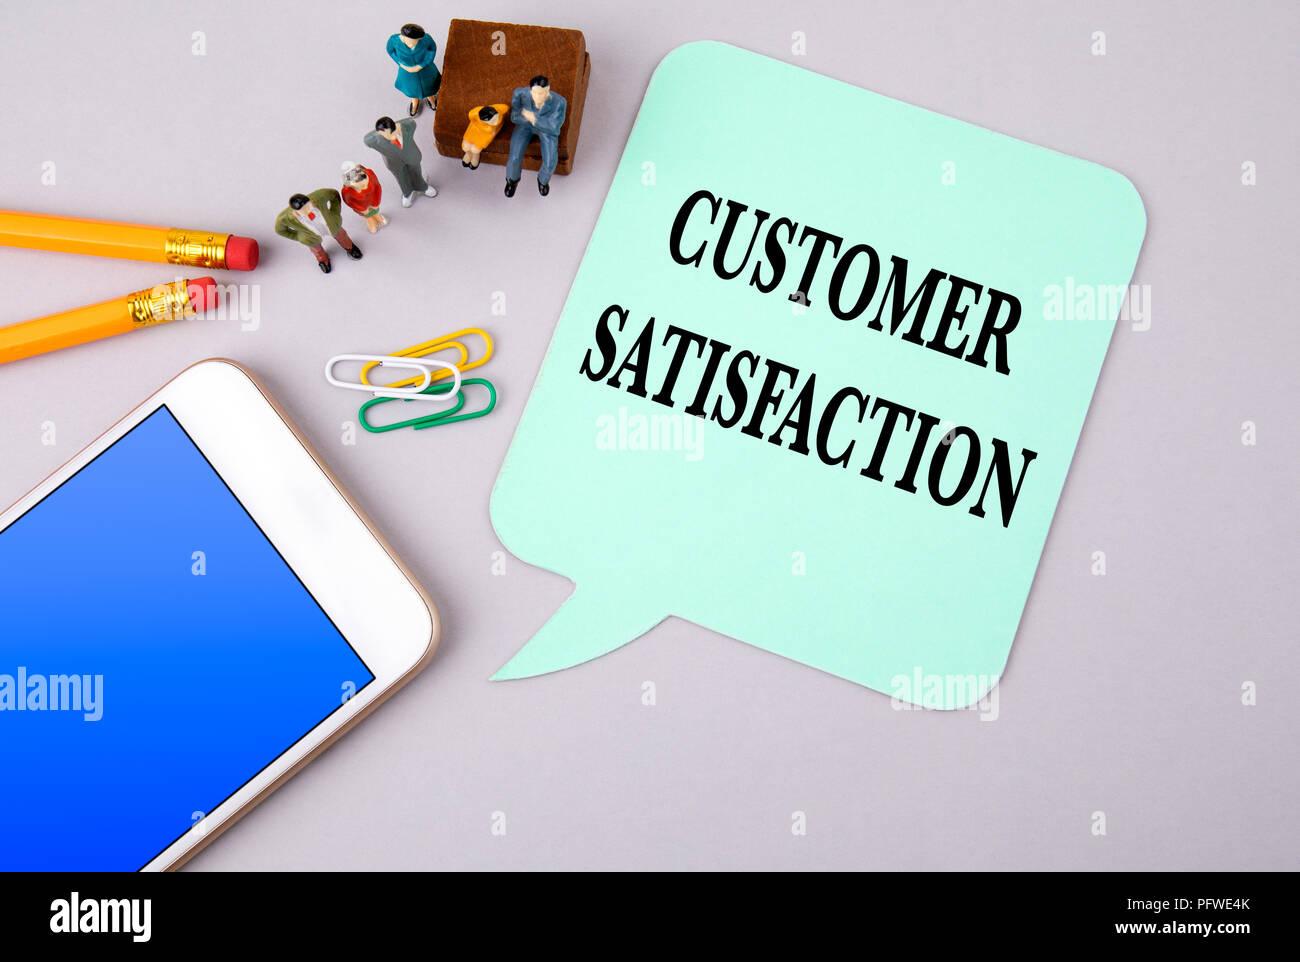 customer satisfaction concept - Stock Image